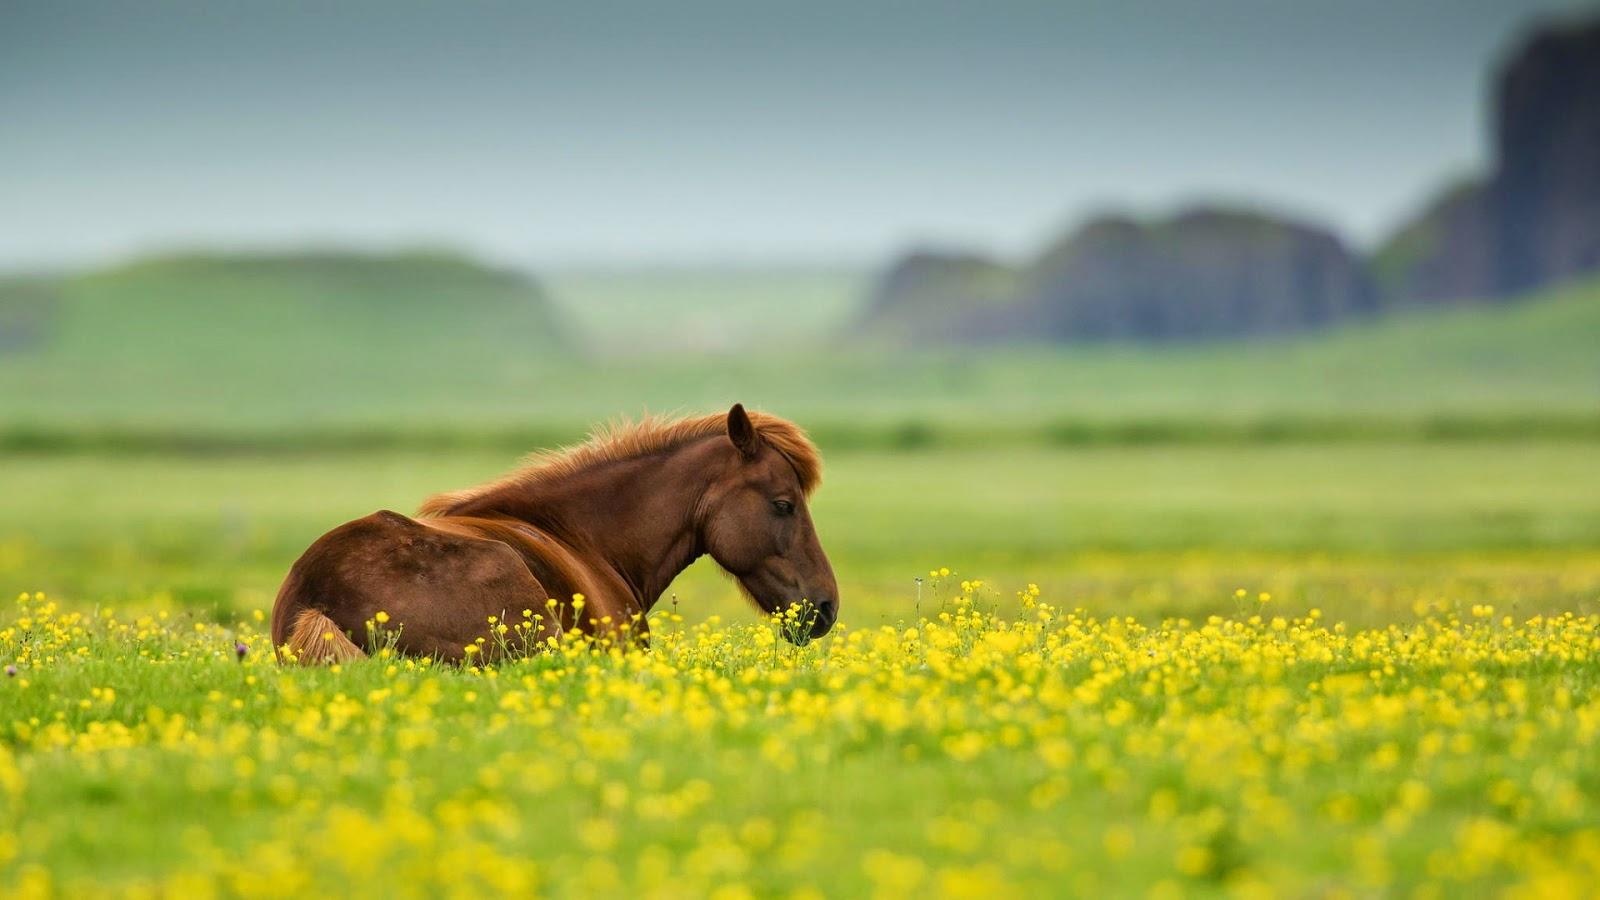 Most Inspiring   Wallpaper Horse Green - wxp%2B(30)  Best Photo Reference_939734.jpg